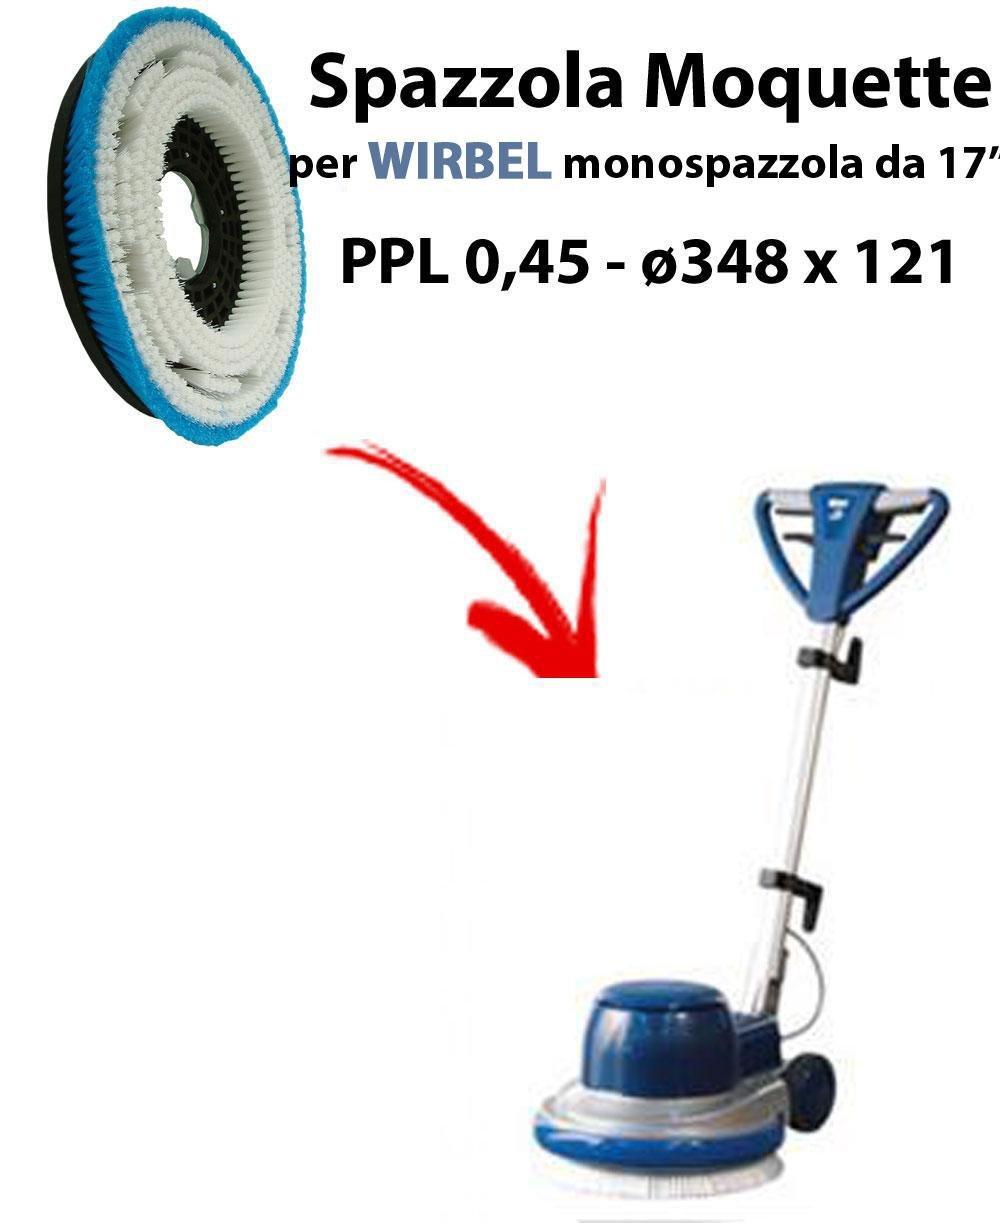 SPAZZOLA MOQUETTE per monospazzola WIRBEL C43. Modello: PPL 0, 45 C/FLANGIA ø 348 X 121 45 C/FLANGIA ø348 X 121 Synclean